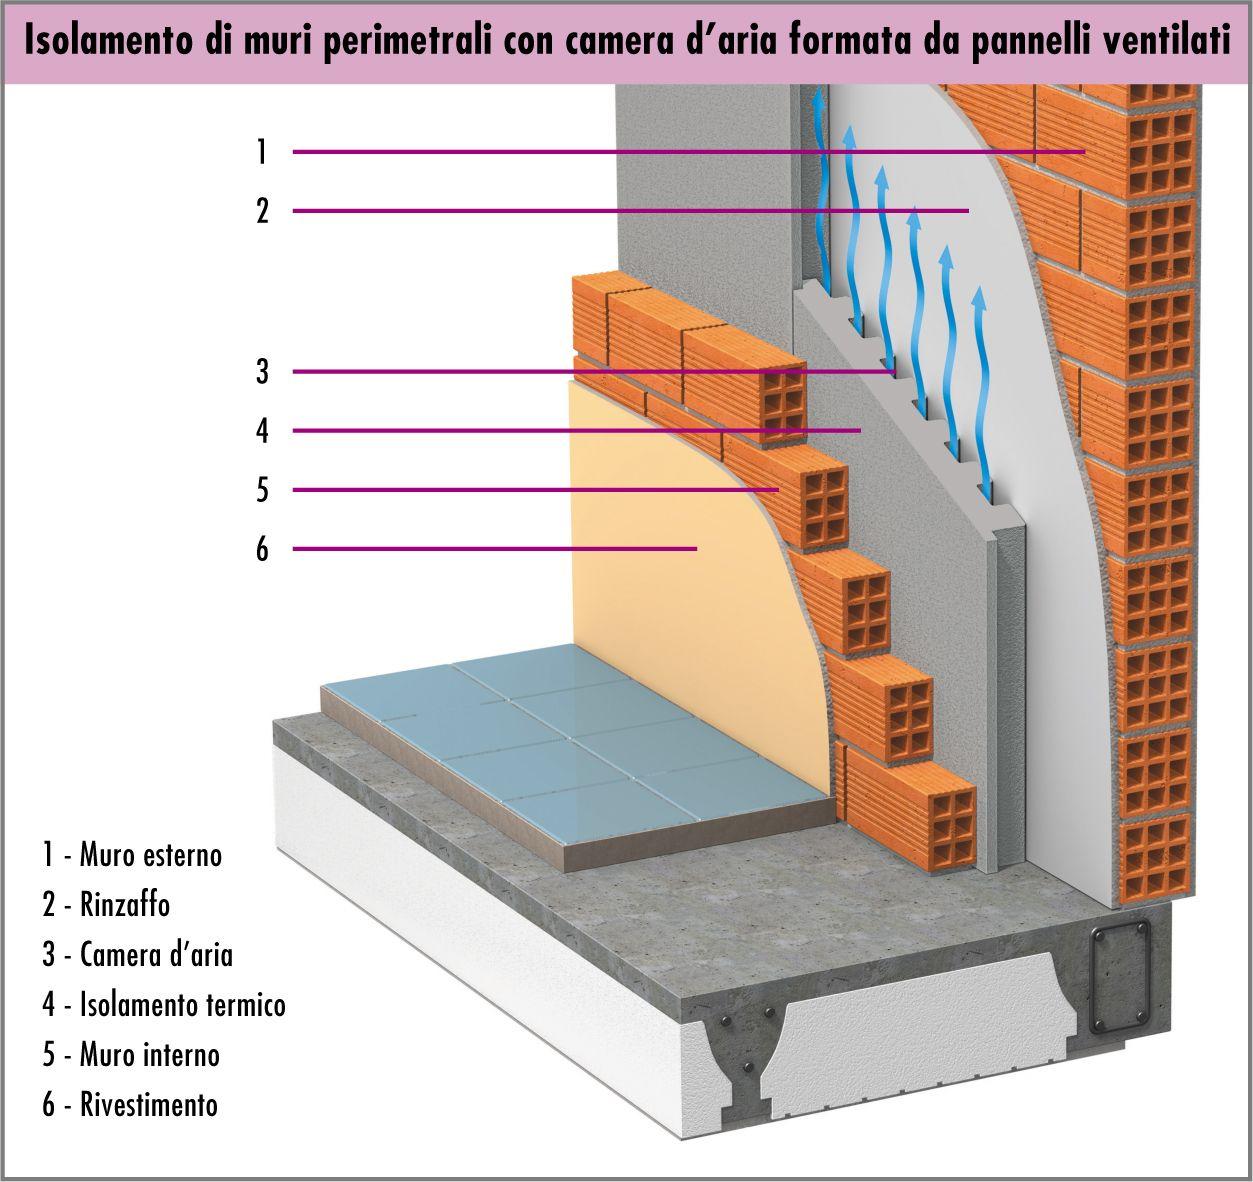 Painel termo isolante de eps grafite knauf xtherm muro th32 by knauf insulation cantarana - Isolamento termico dall interno ...